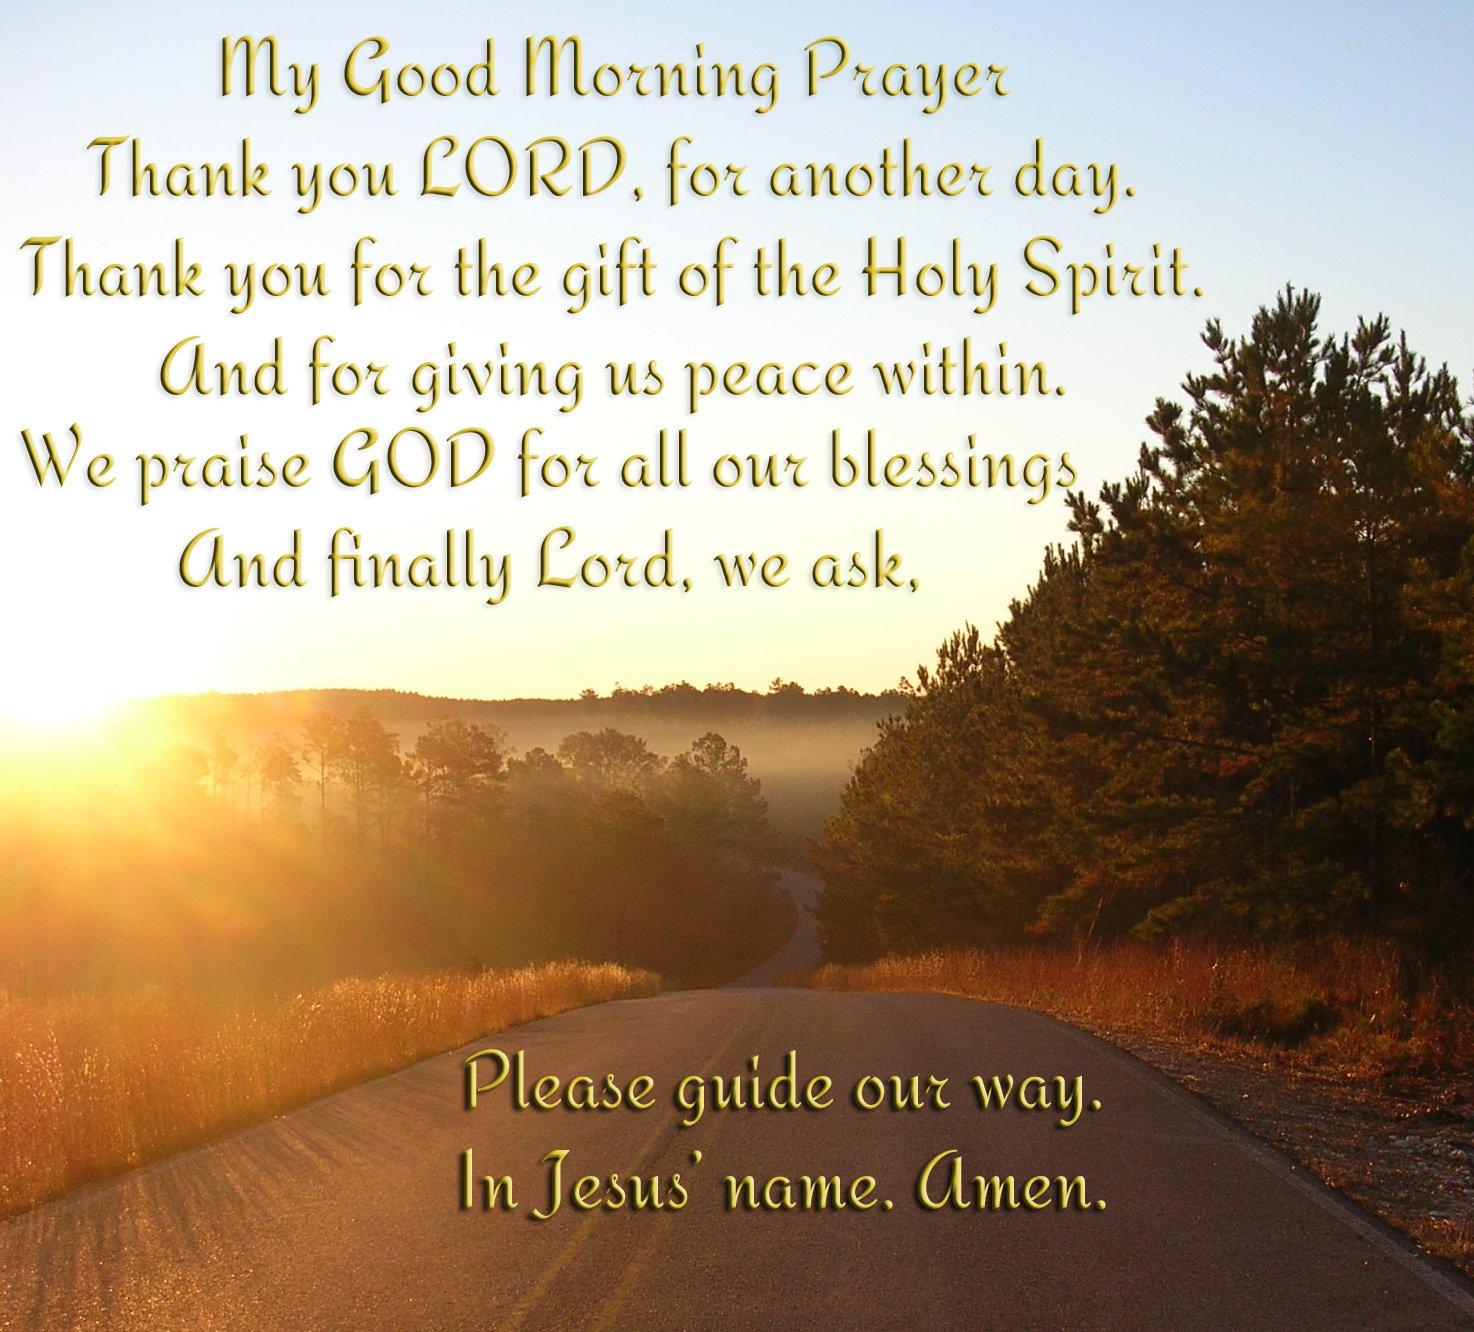 Best Spiritual Good Morning Quotes: Christian Quotes Good Morning. QuotesGram